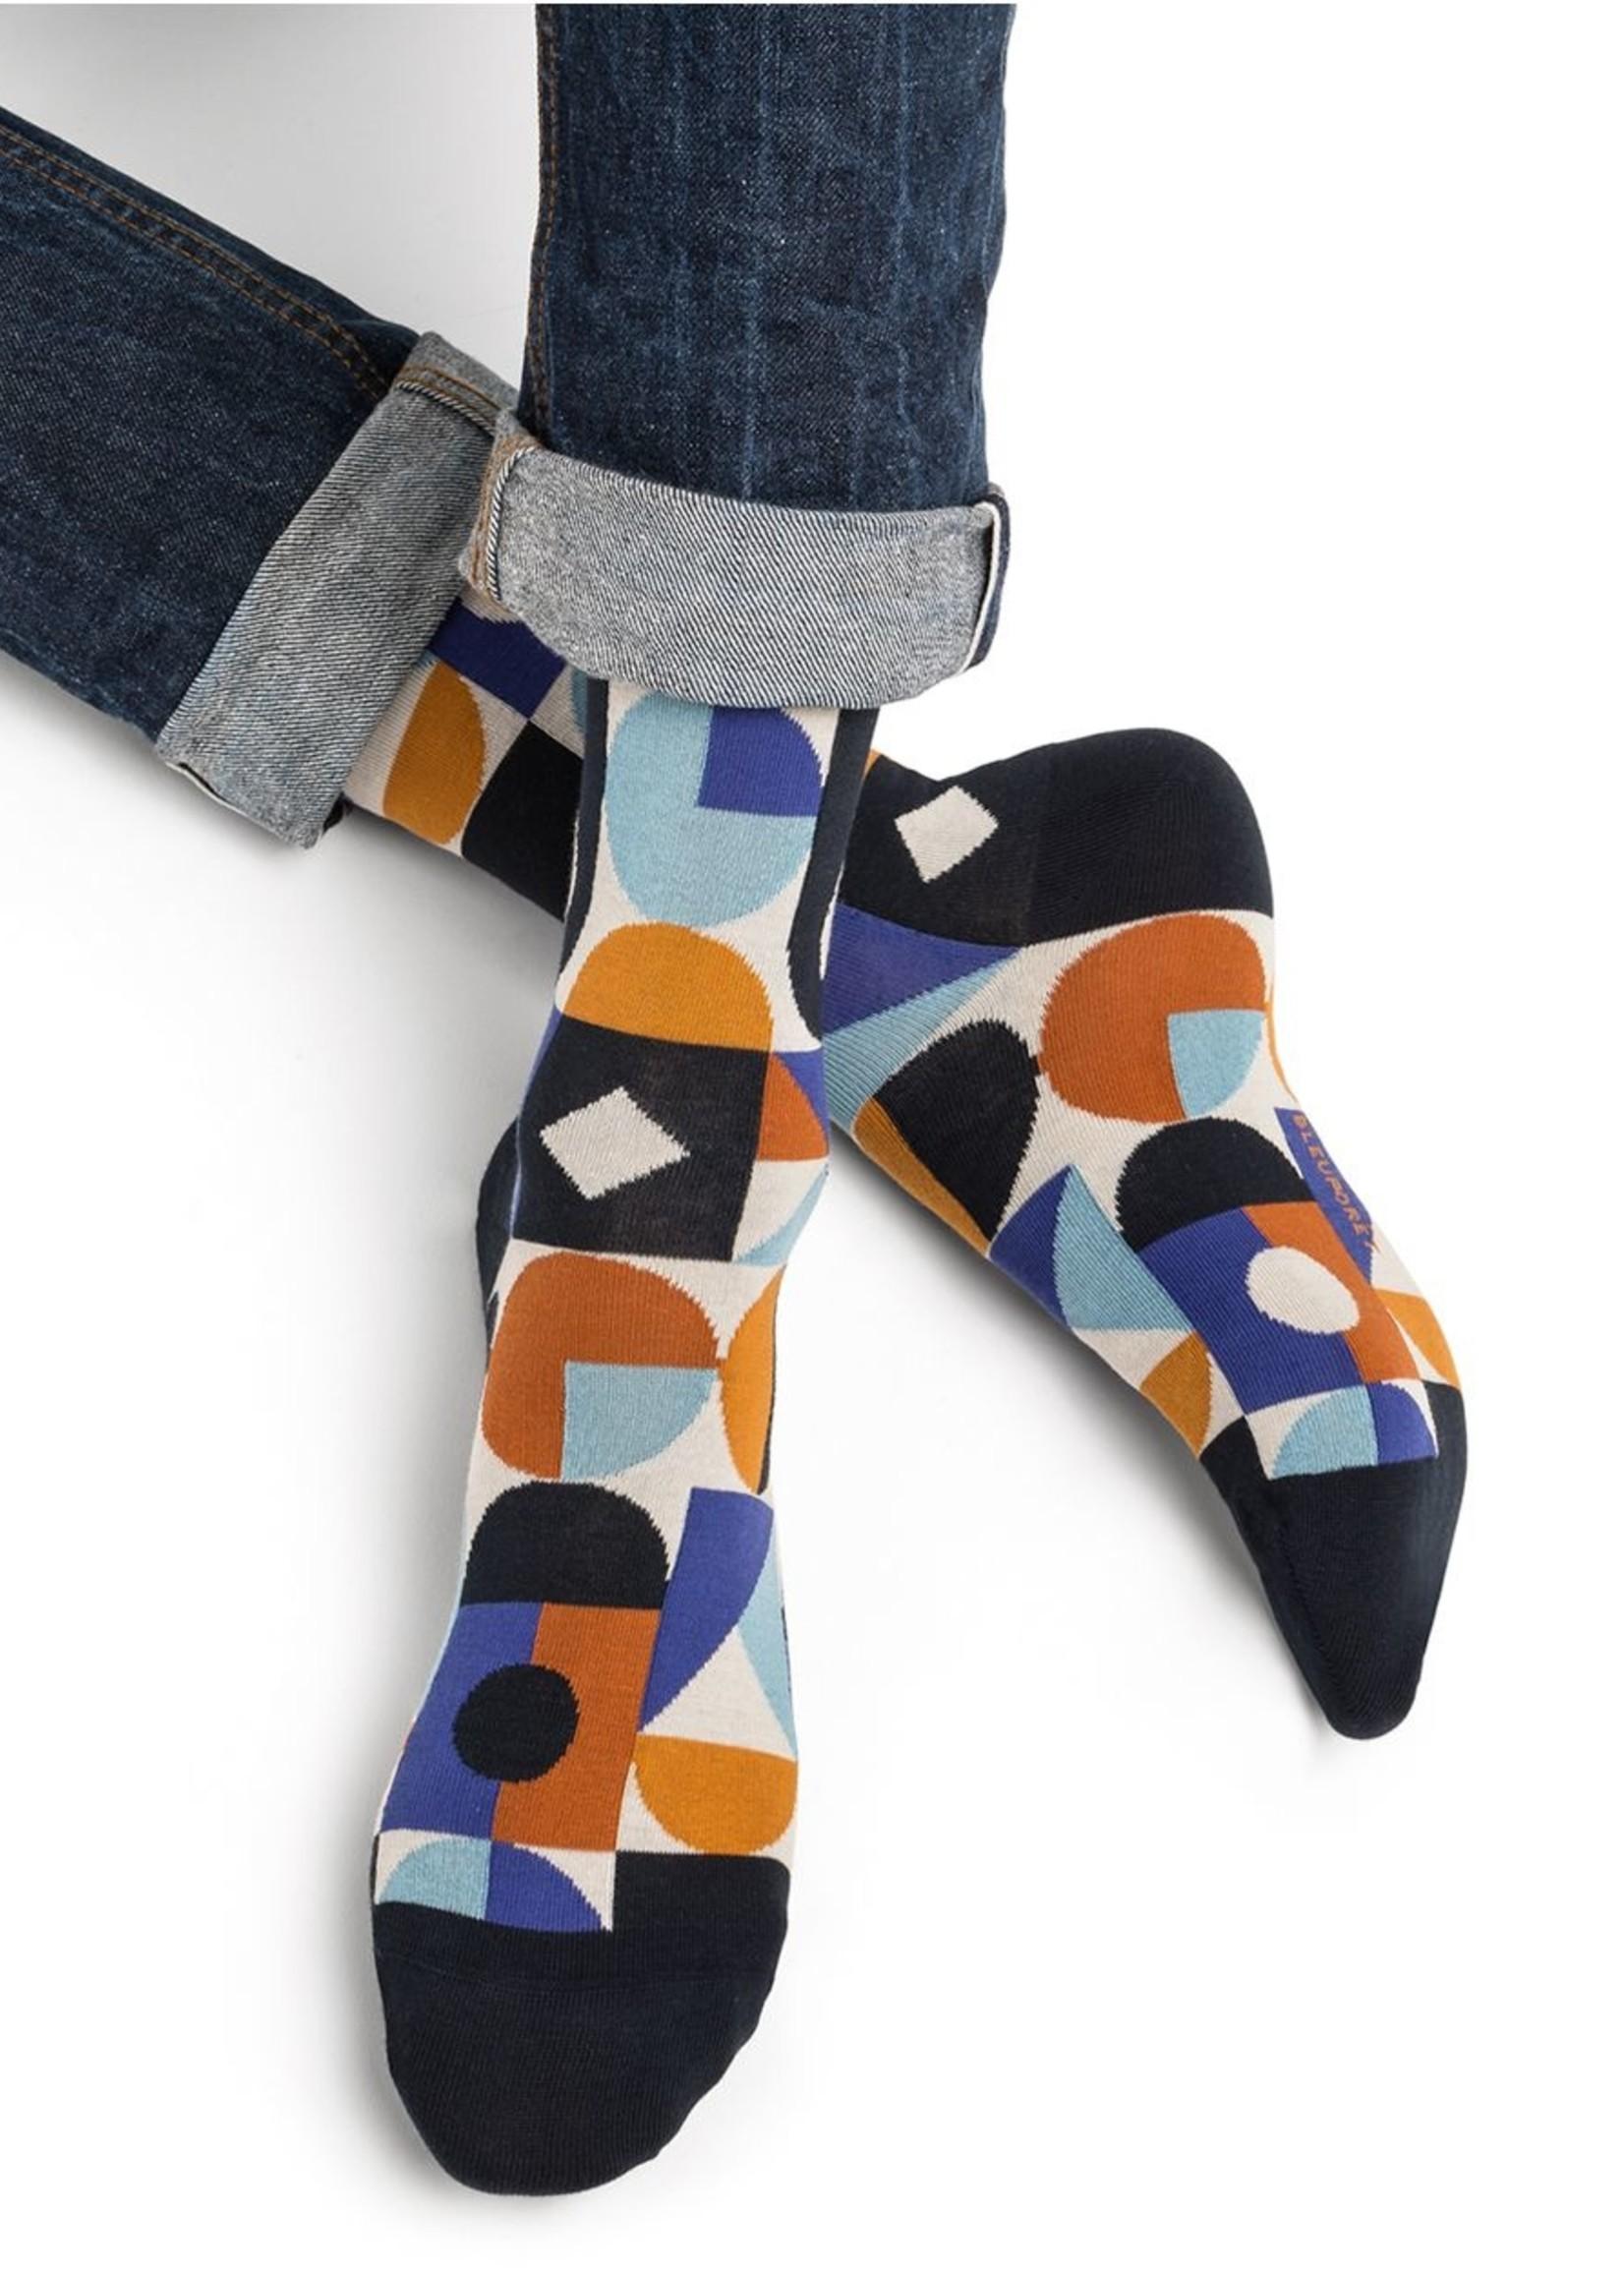 Bleuforet Men's Multicolour Geometric Pattern Socks